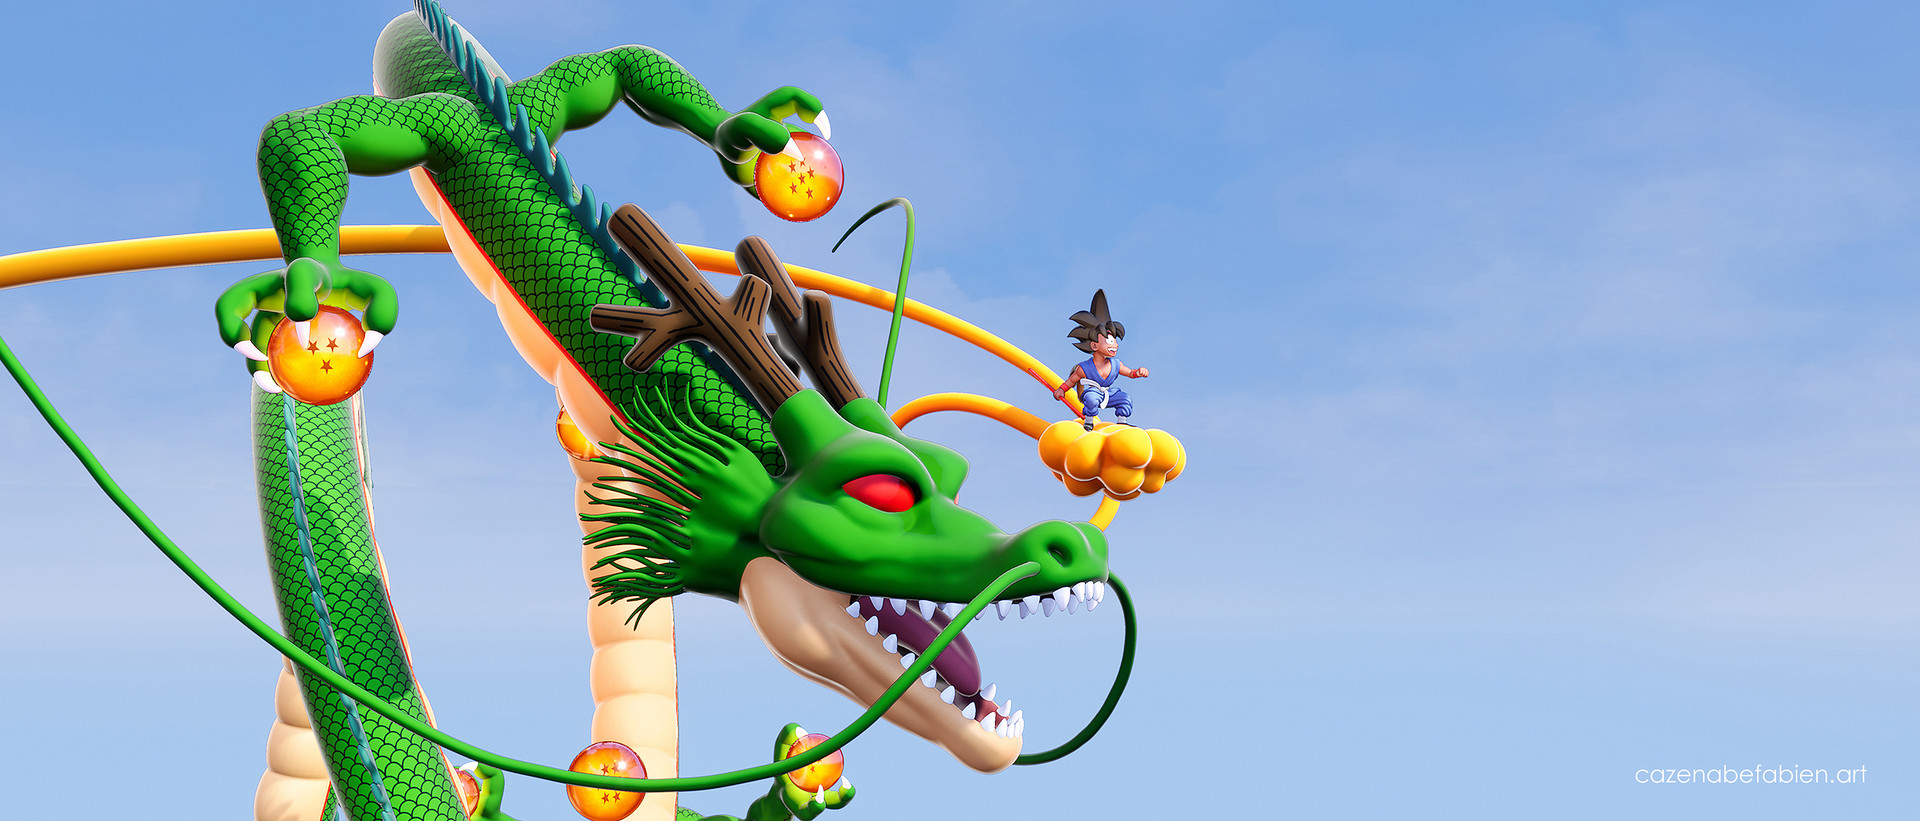 Fabien cazenabe sangoku dragon ball sculpt zbrush unreal 3d 02